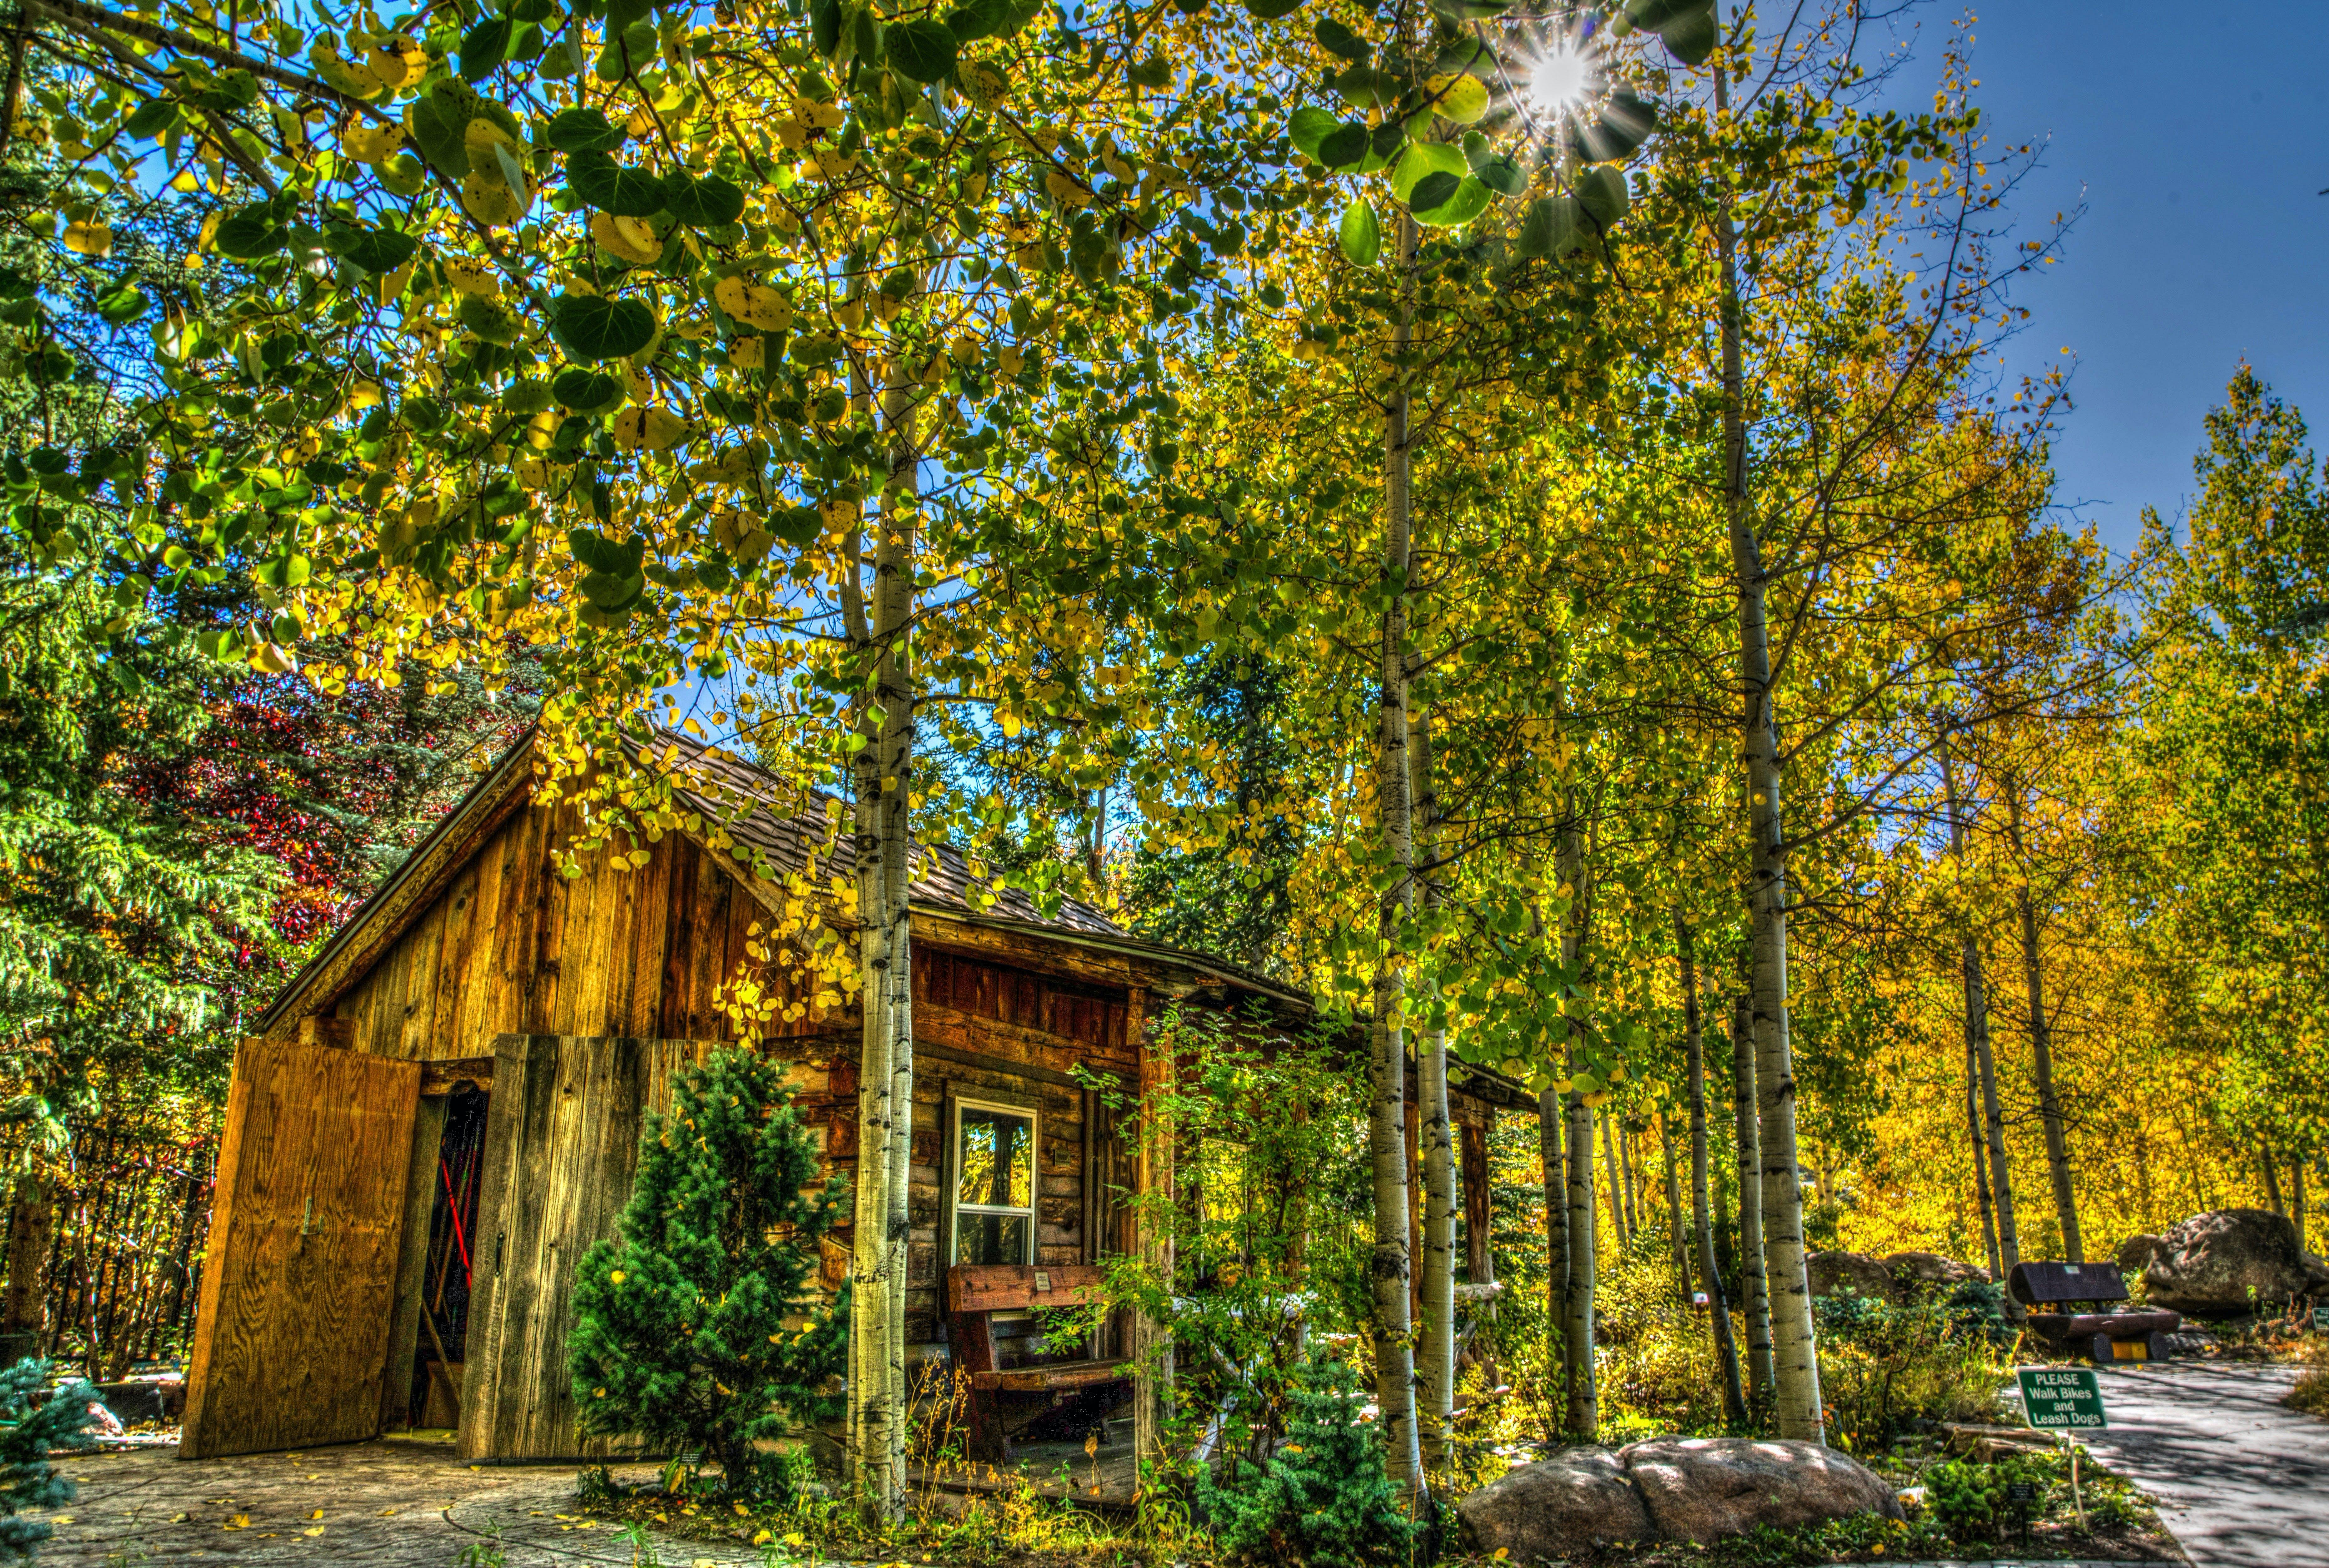 Gratis stockfoto met architectuur, blauwe lucht, bomen, Bos